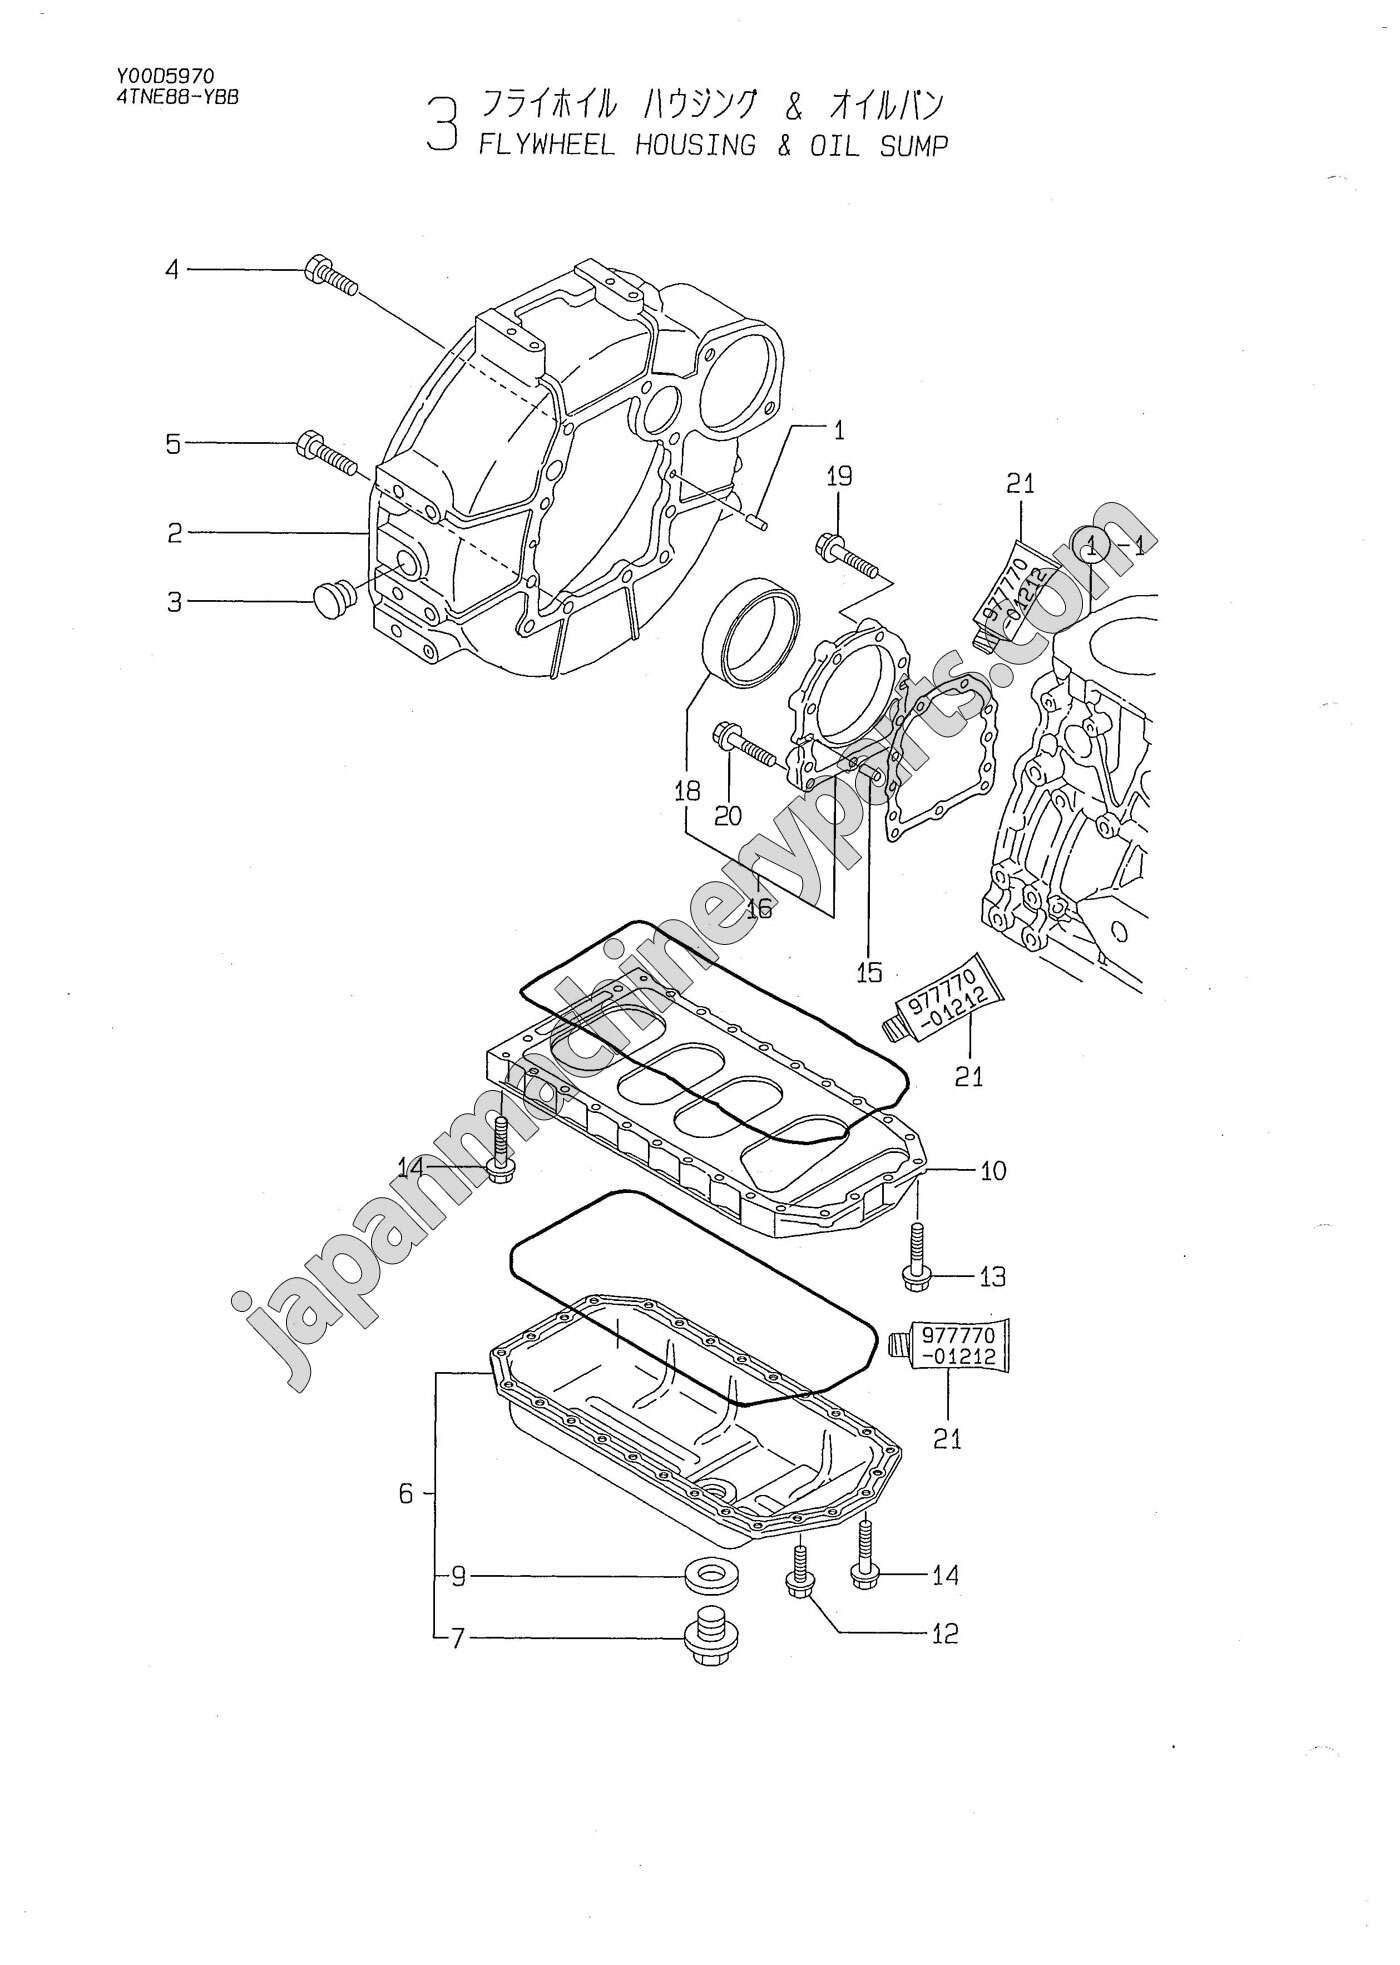 Parts for YANMAR 4TNE88-YBB